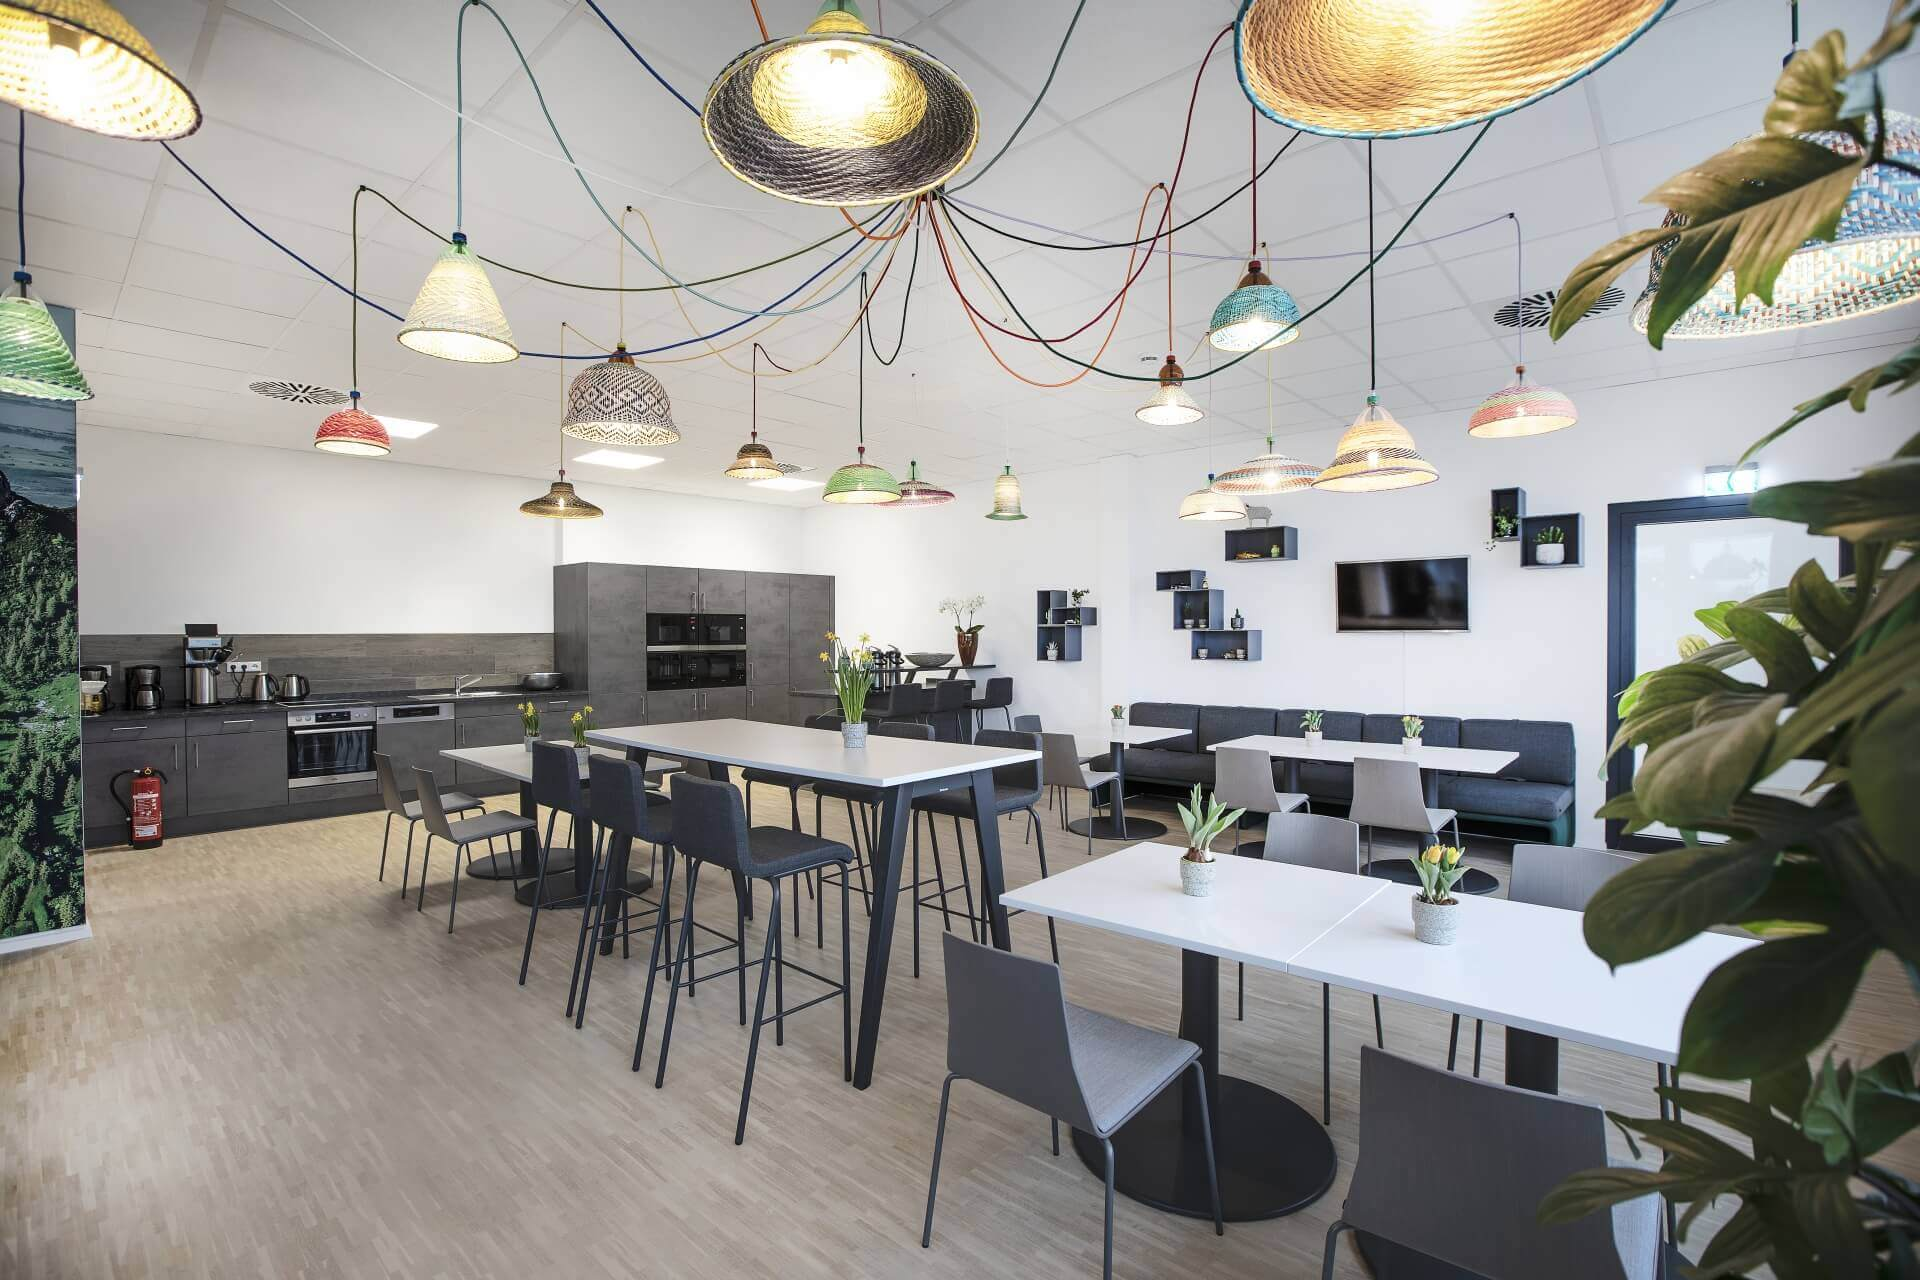 Full Size of Büro Küche 100 Cm Leichte Büroküche Büro Küche Planen Rezepte Für Die Büroküche Küche Büroküche